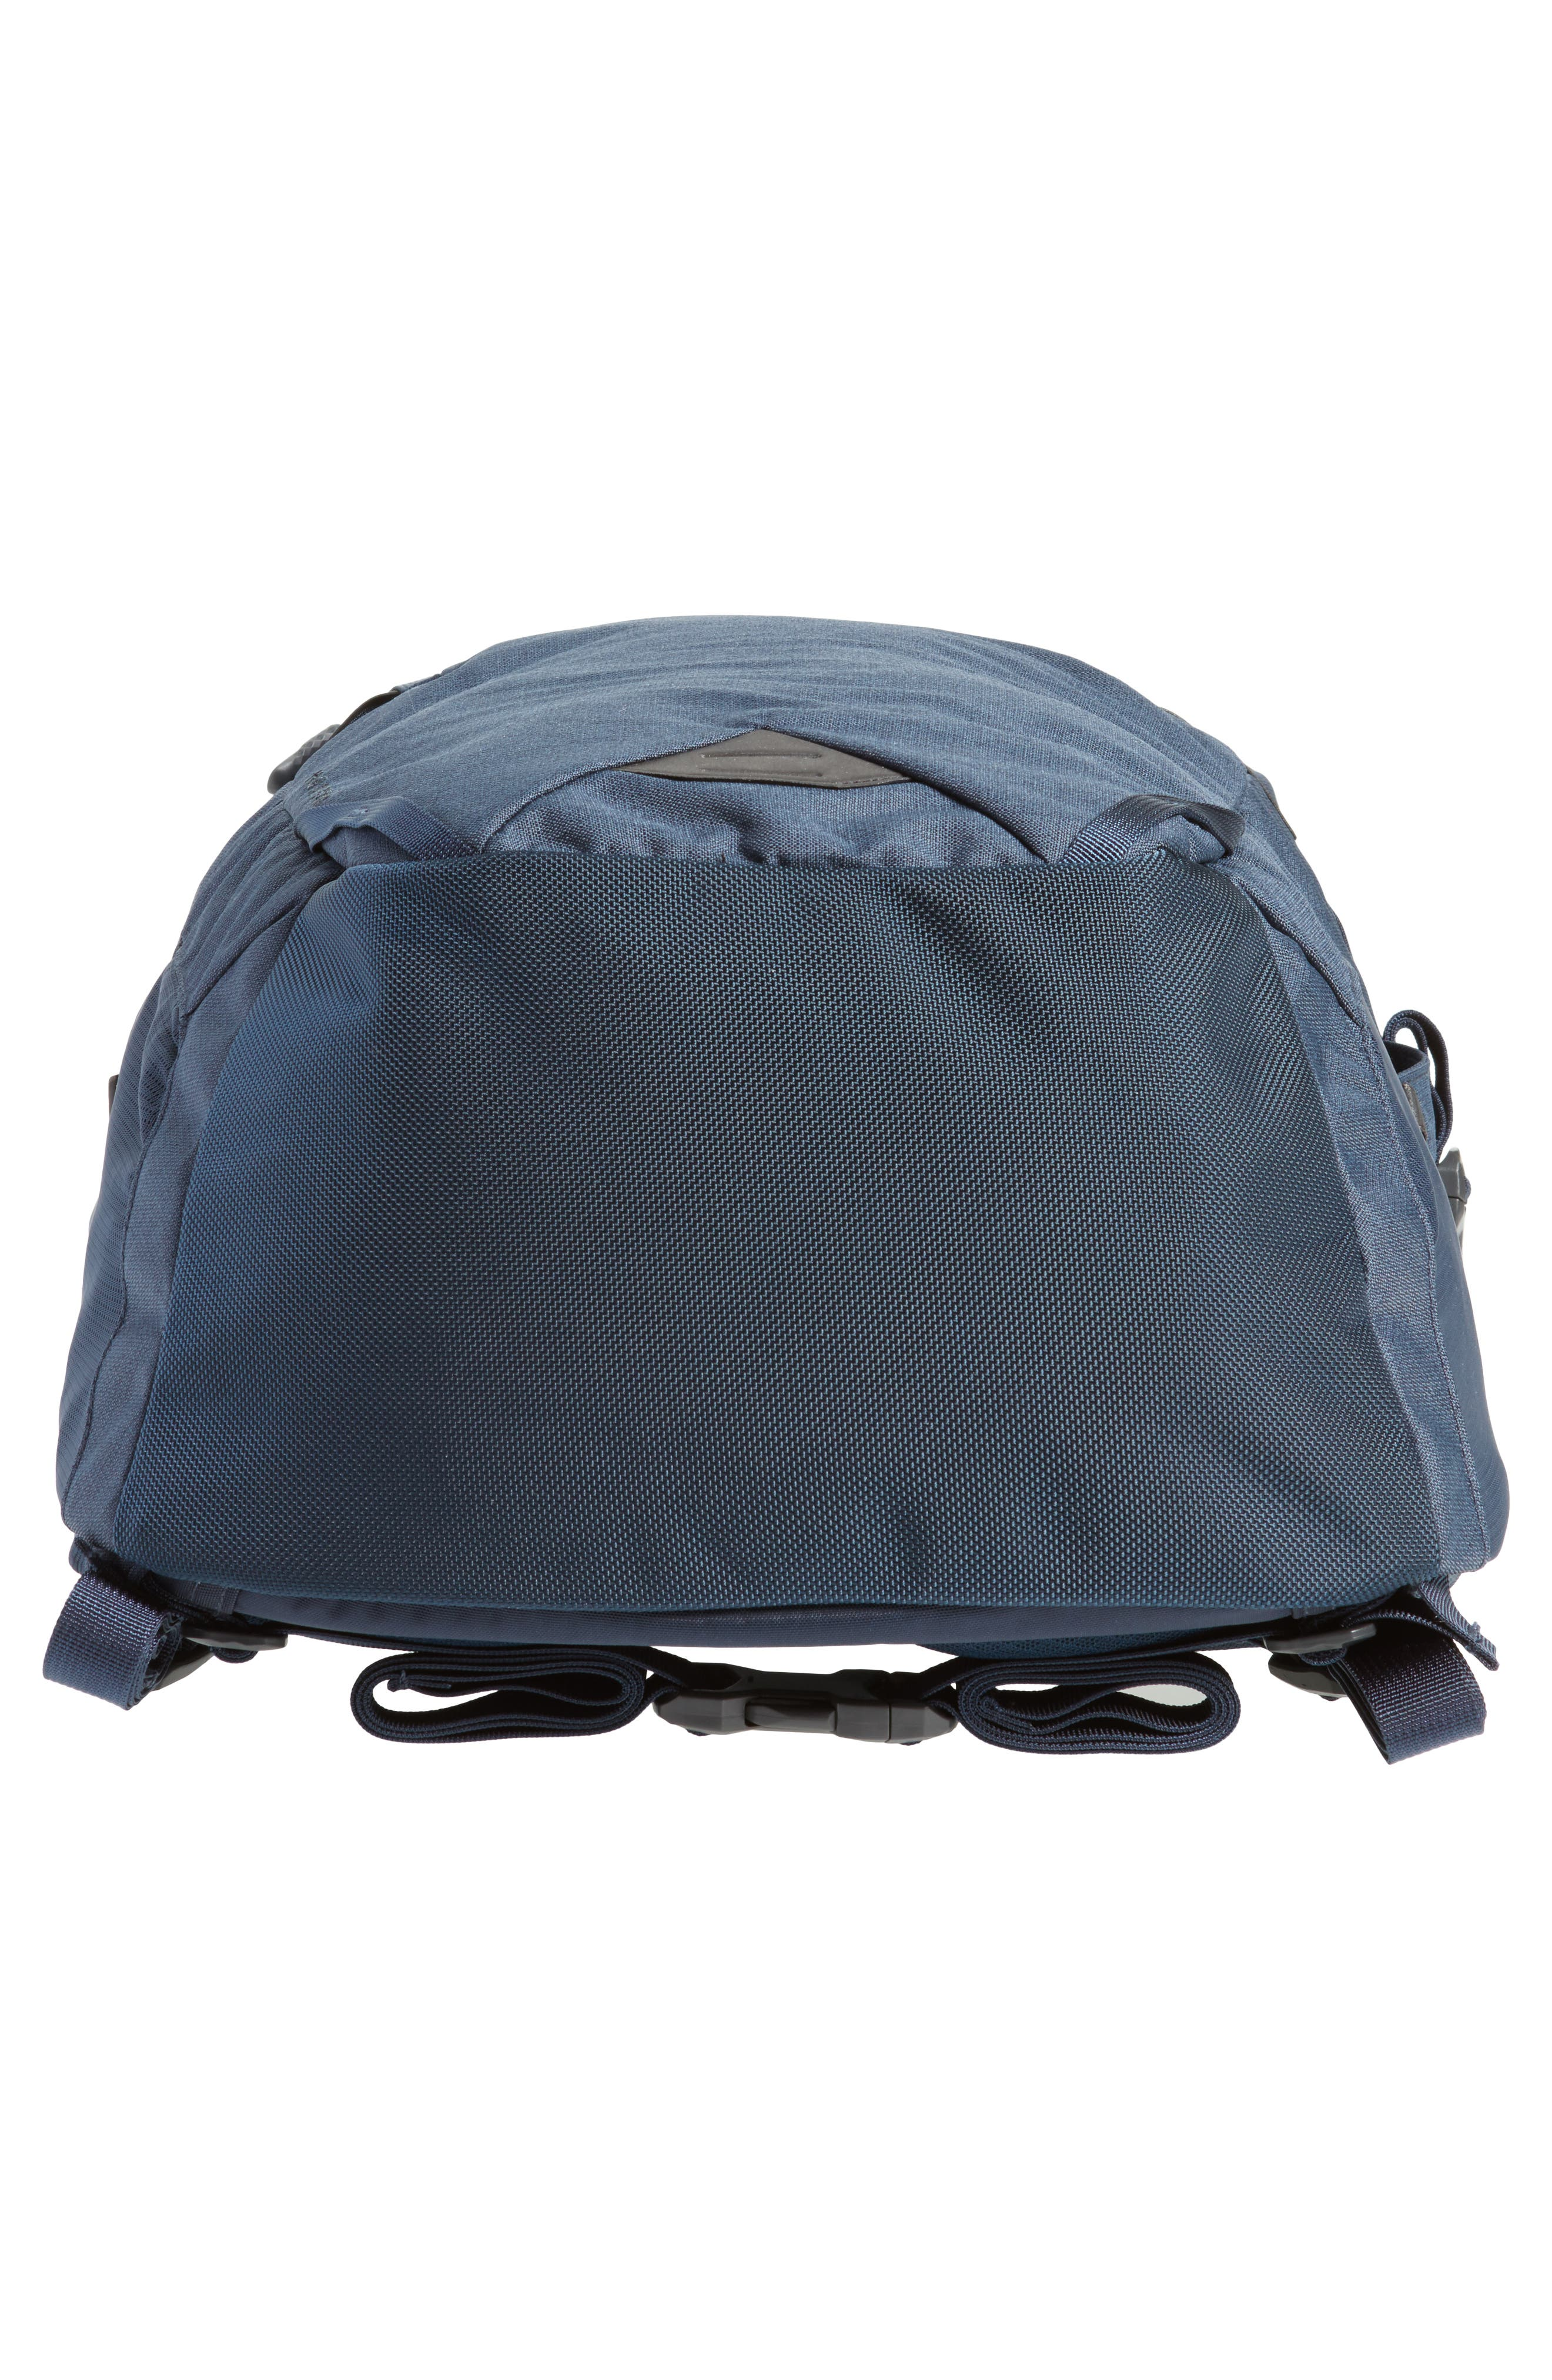 Iron Peak Backpack,                             Alternate thumbnail 23, color,